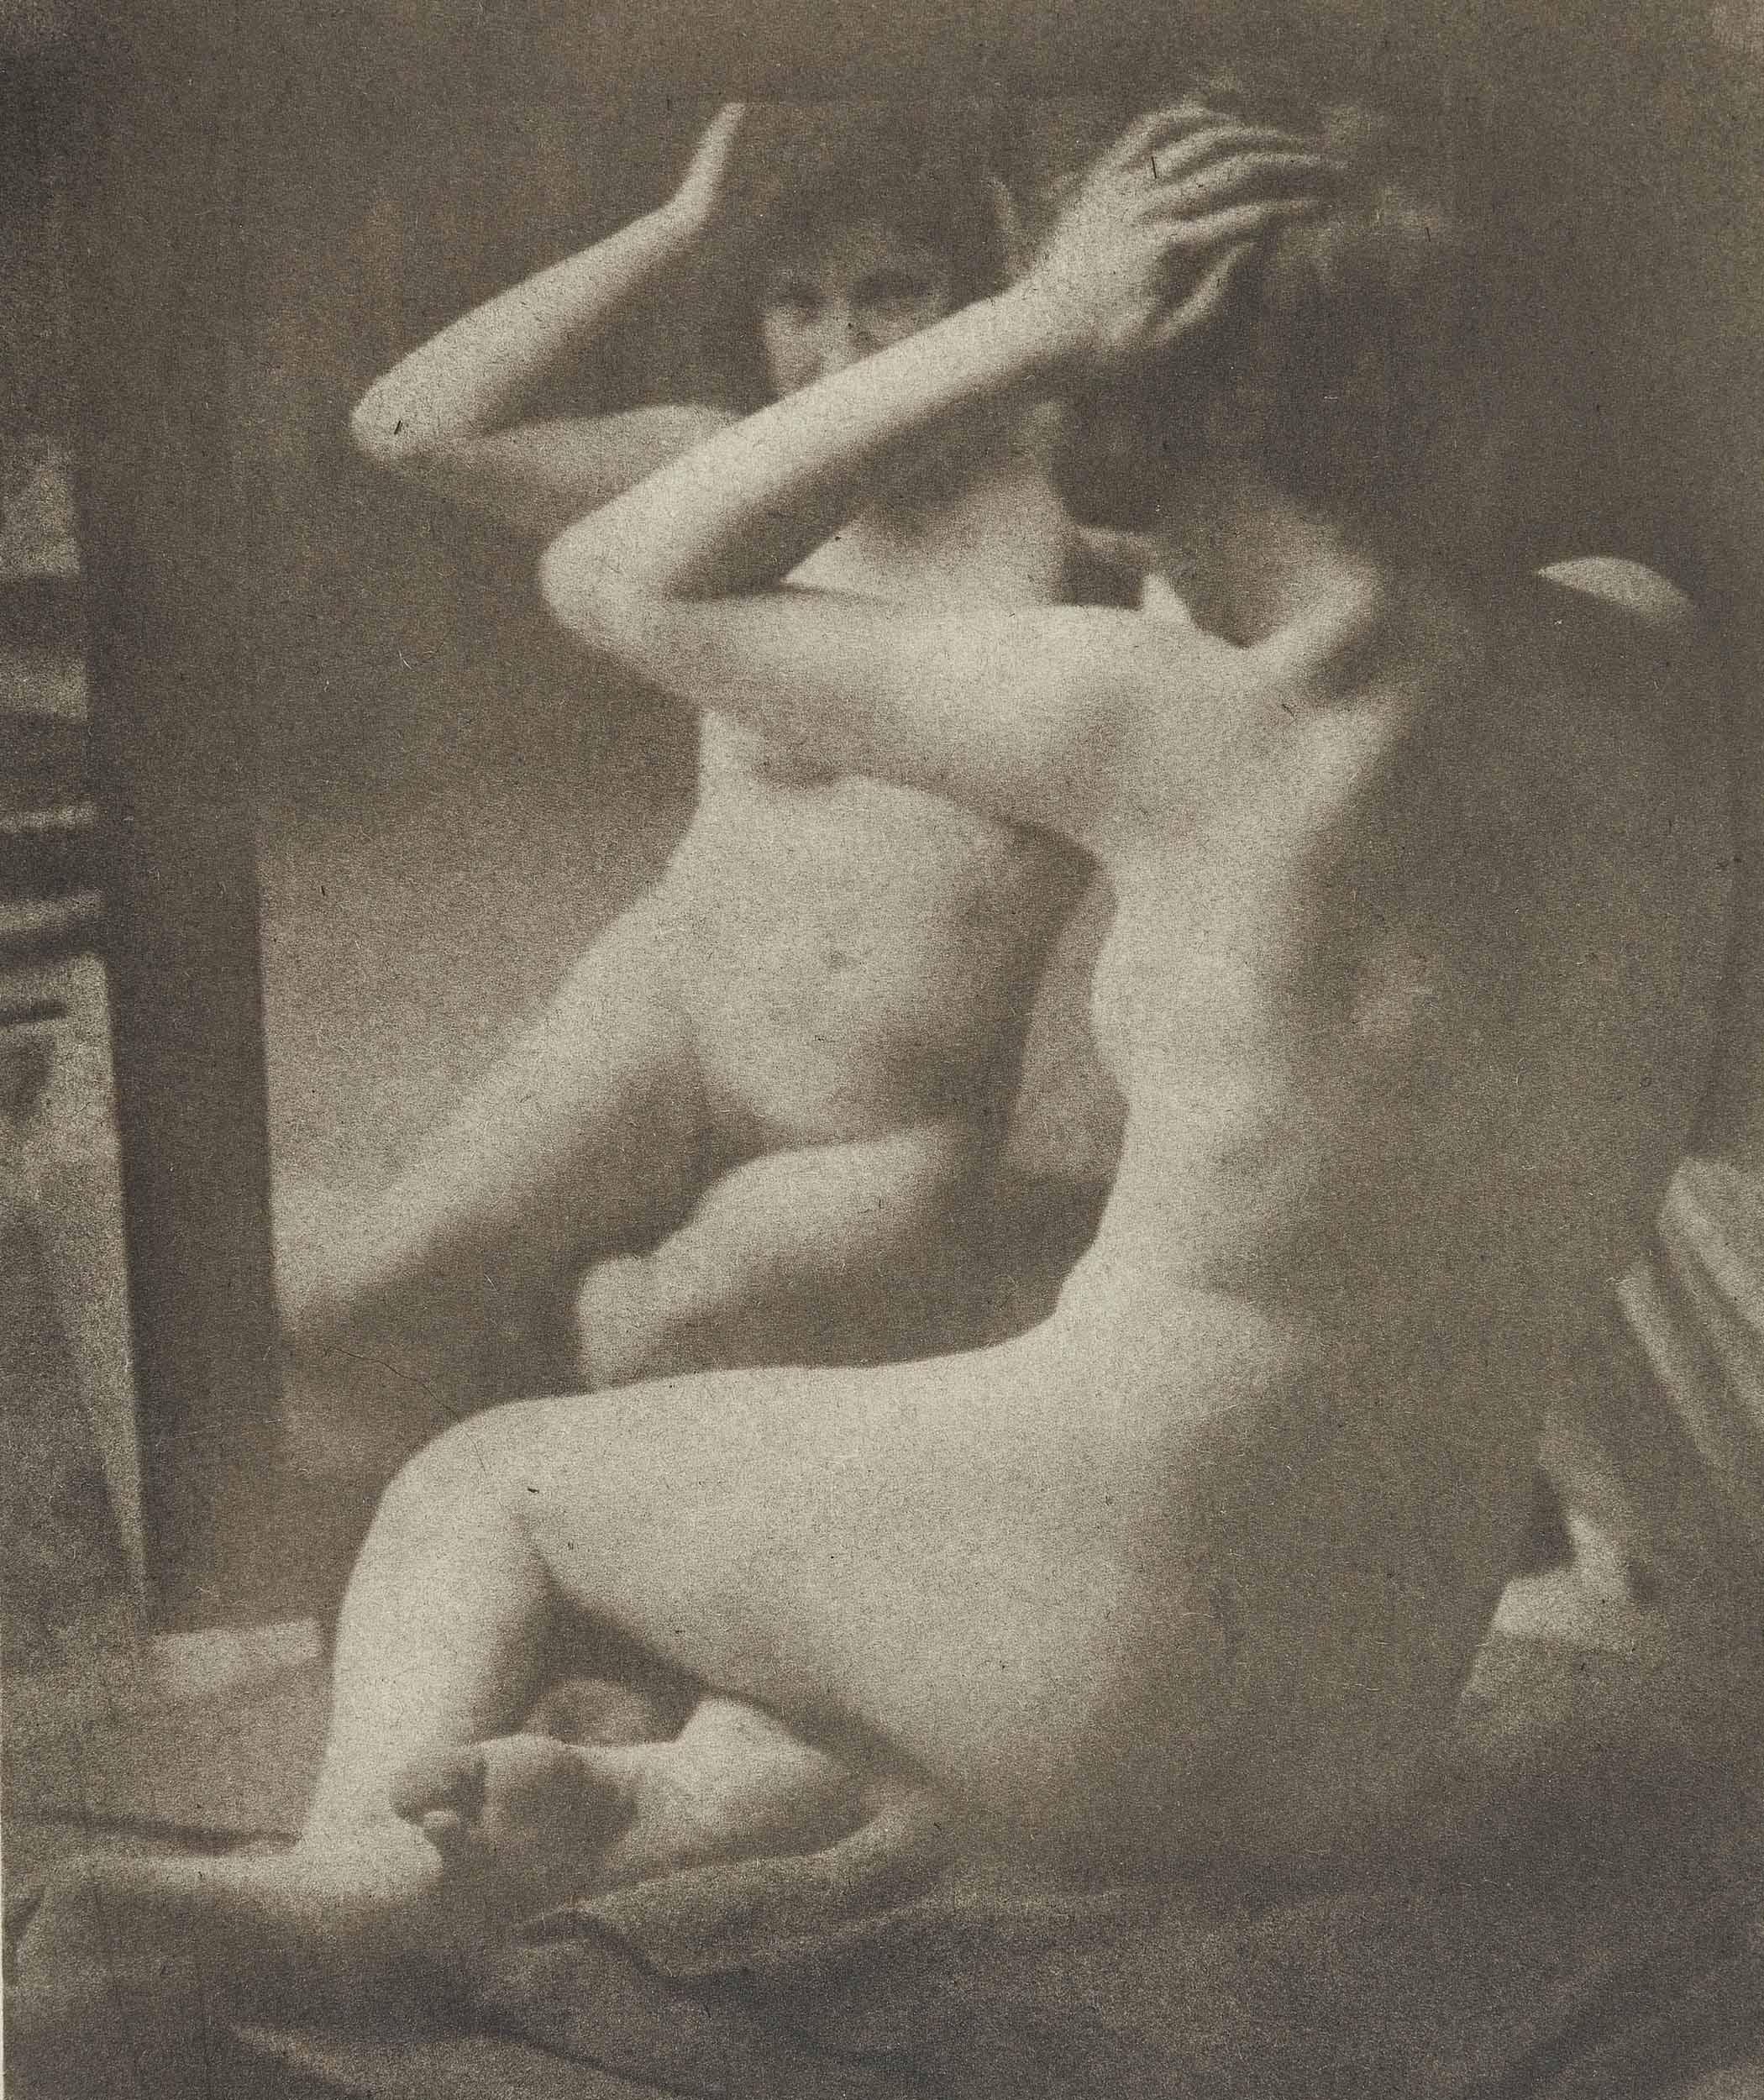 Nude in the Mirror, Tyrol, 1905